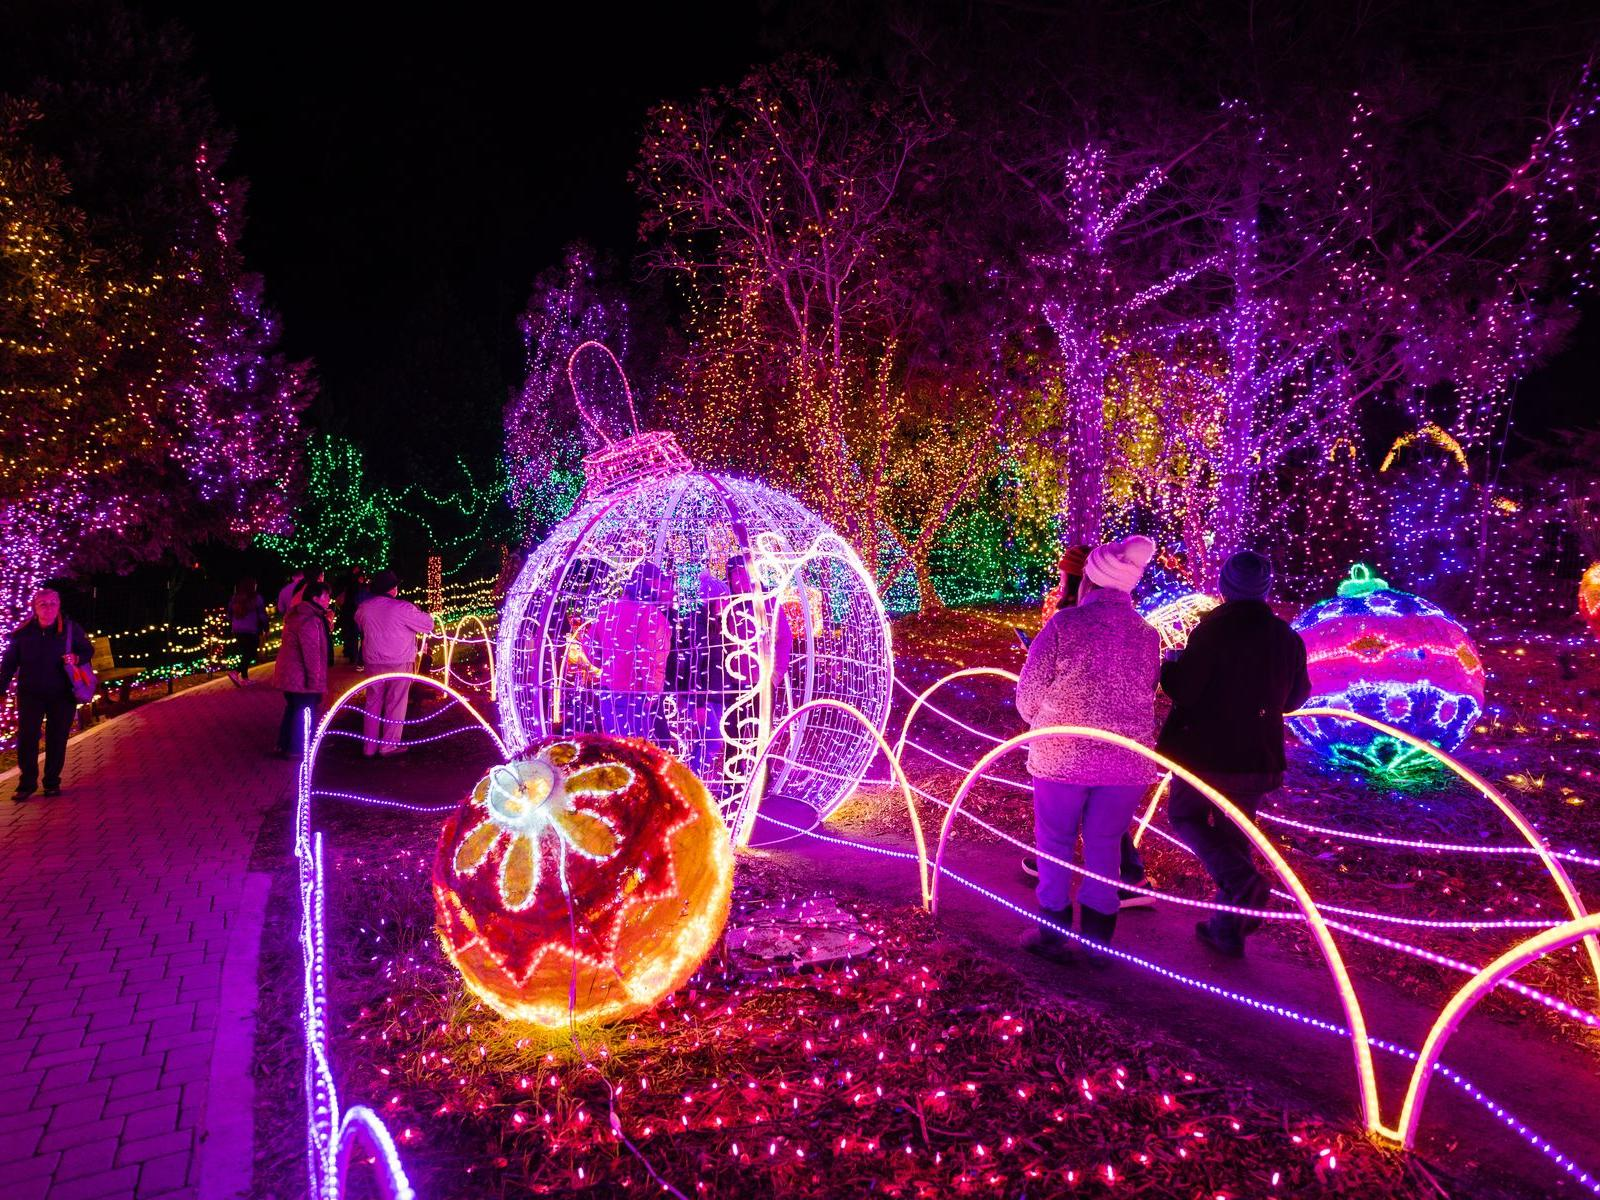 Beautiful Christmas decorations at the Oregon Garden Resort